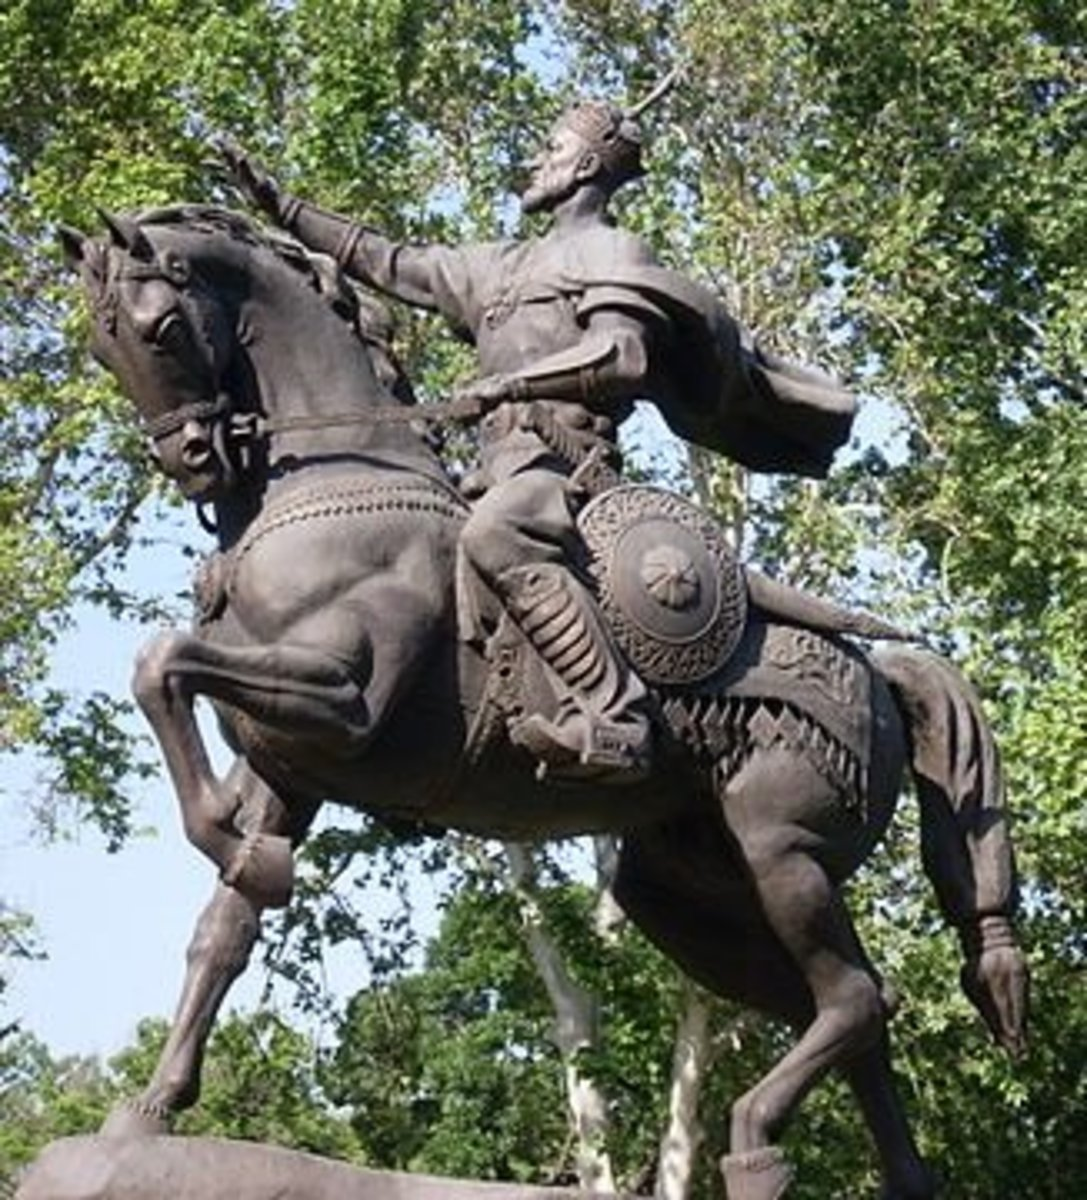 A statue of Tamerlane in Uzbekistan.